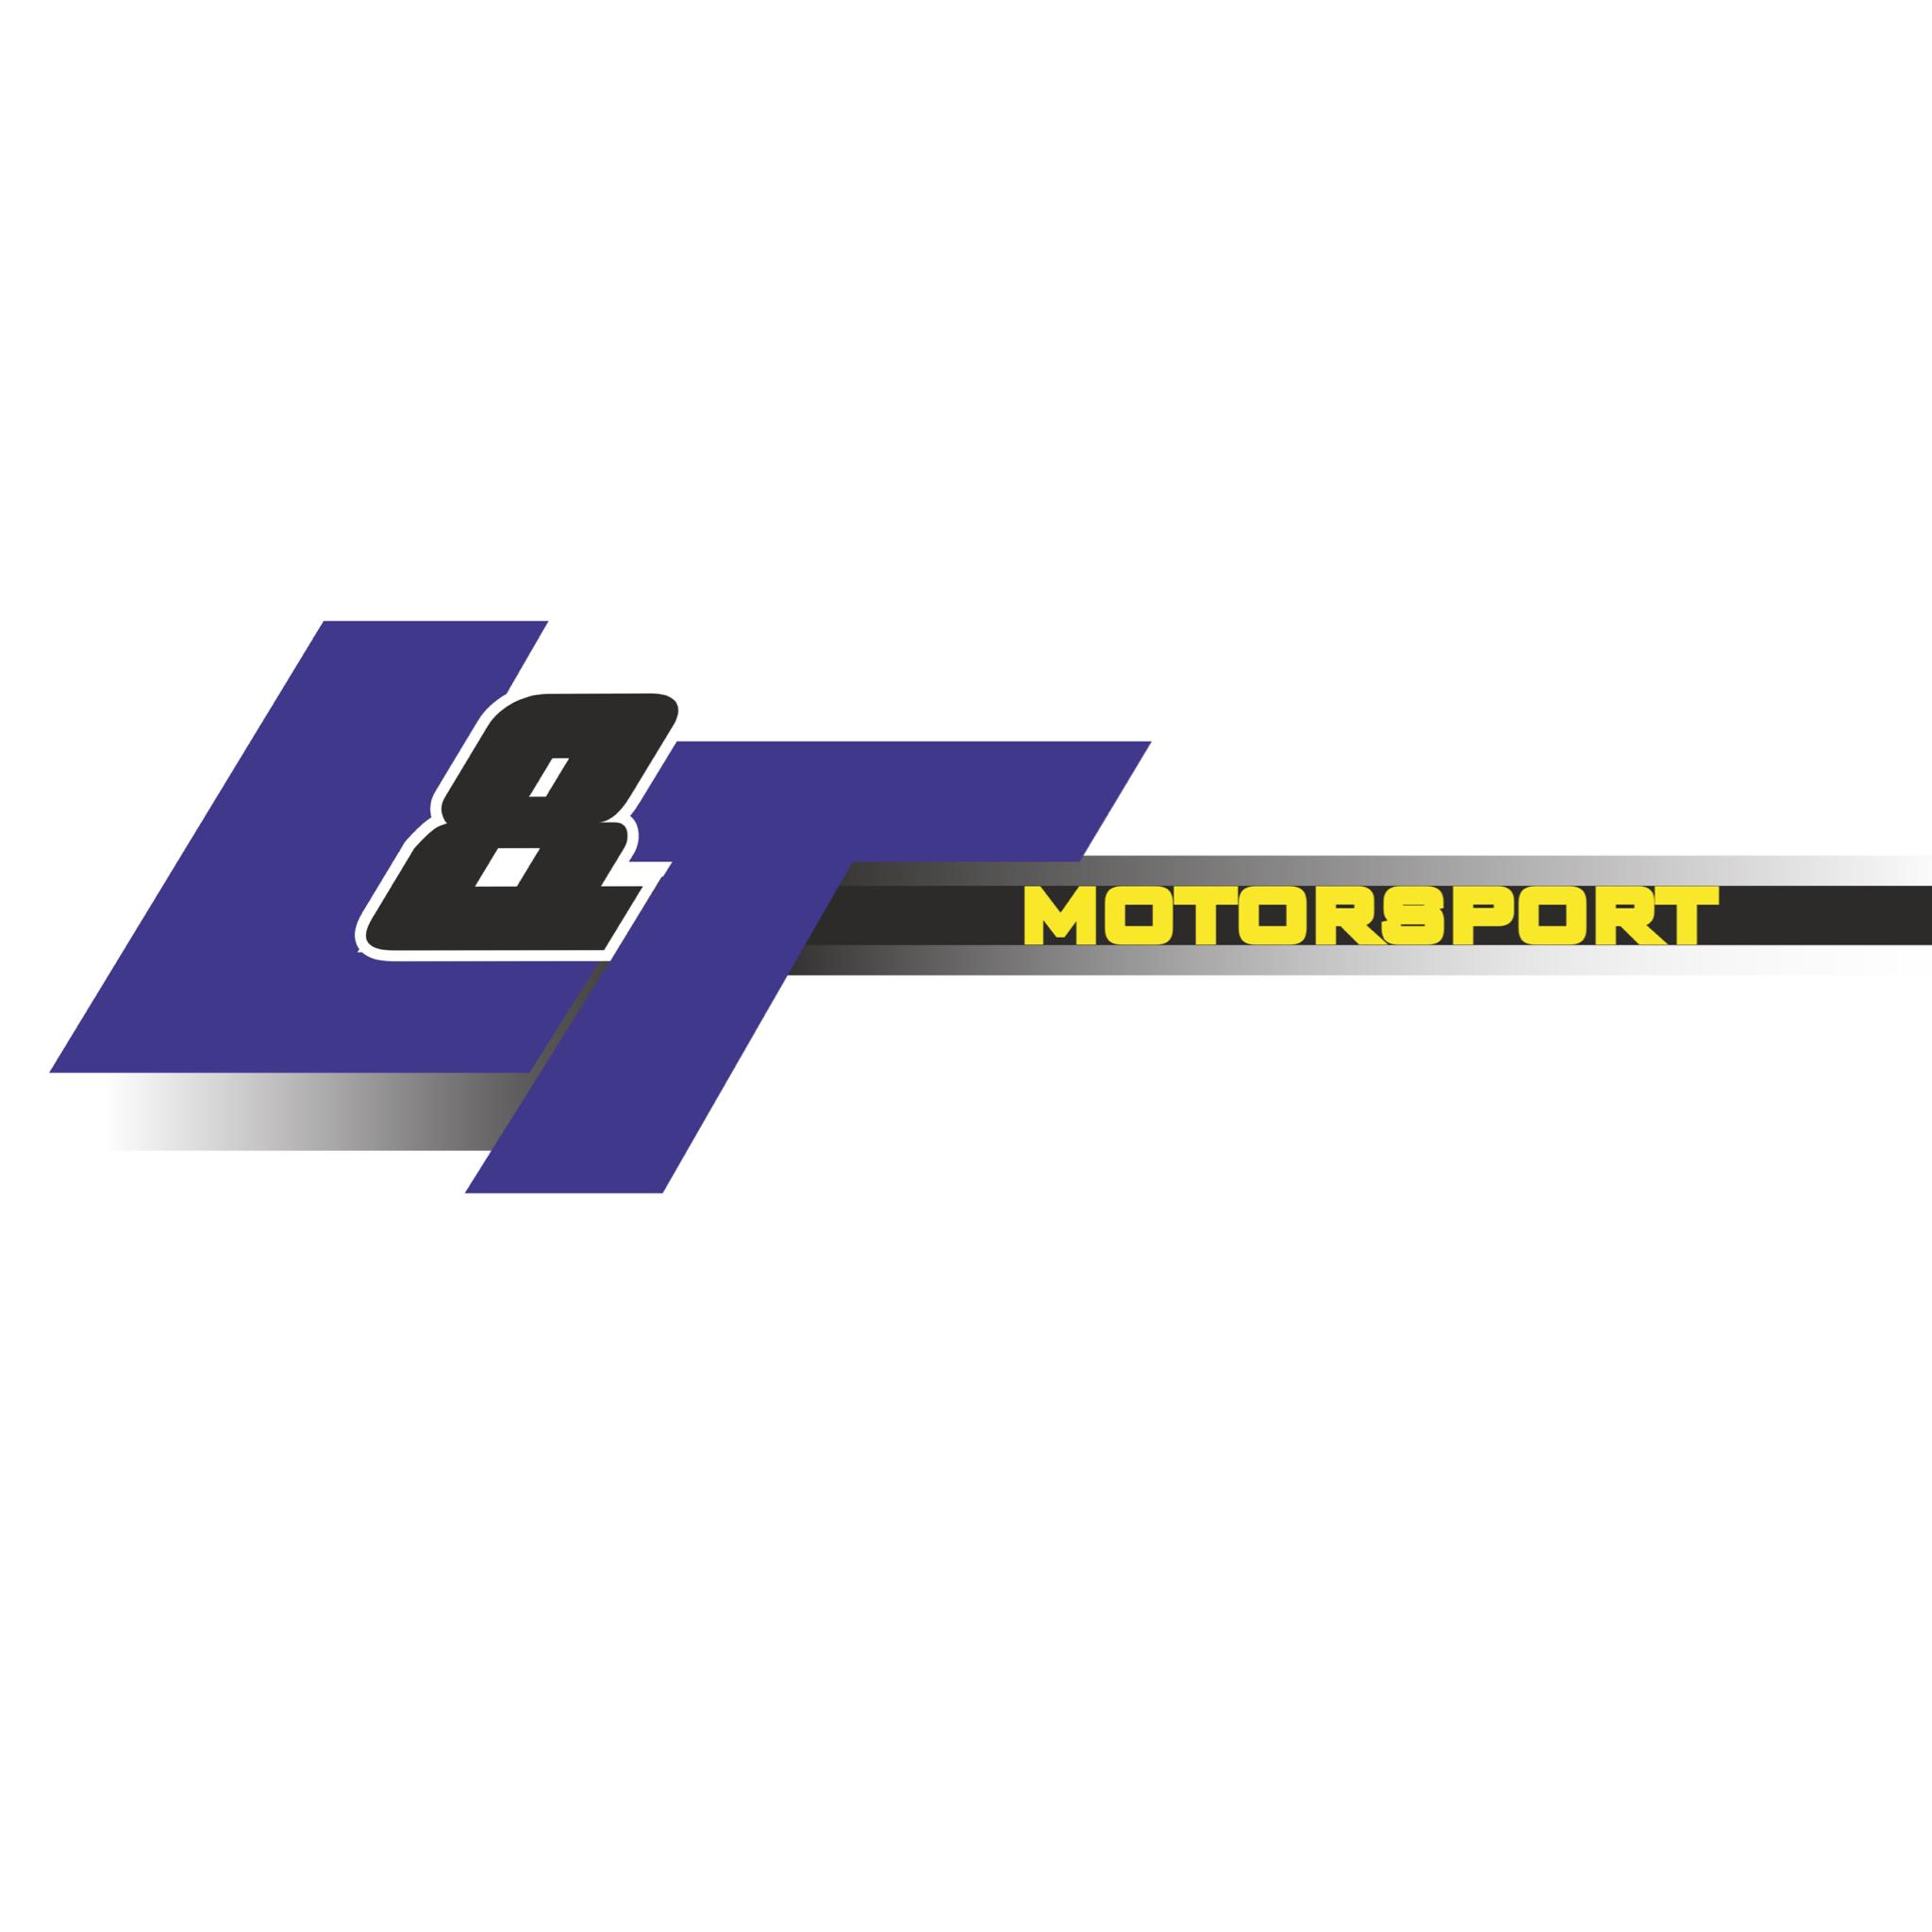 L&T Motorsport